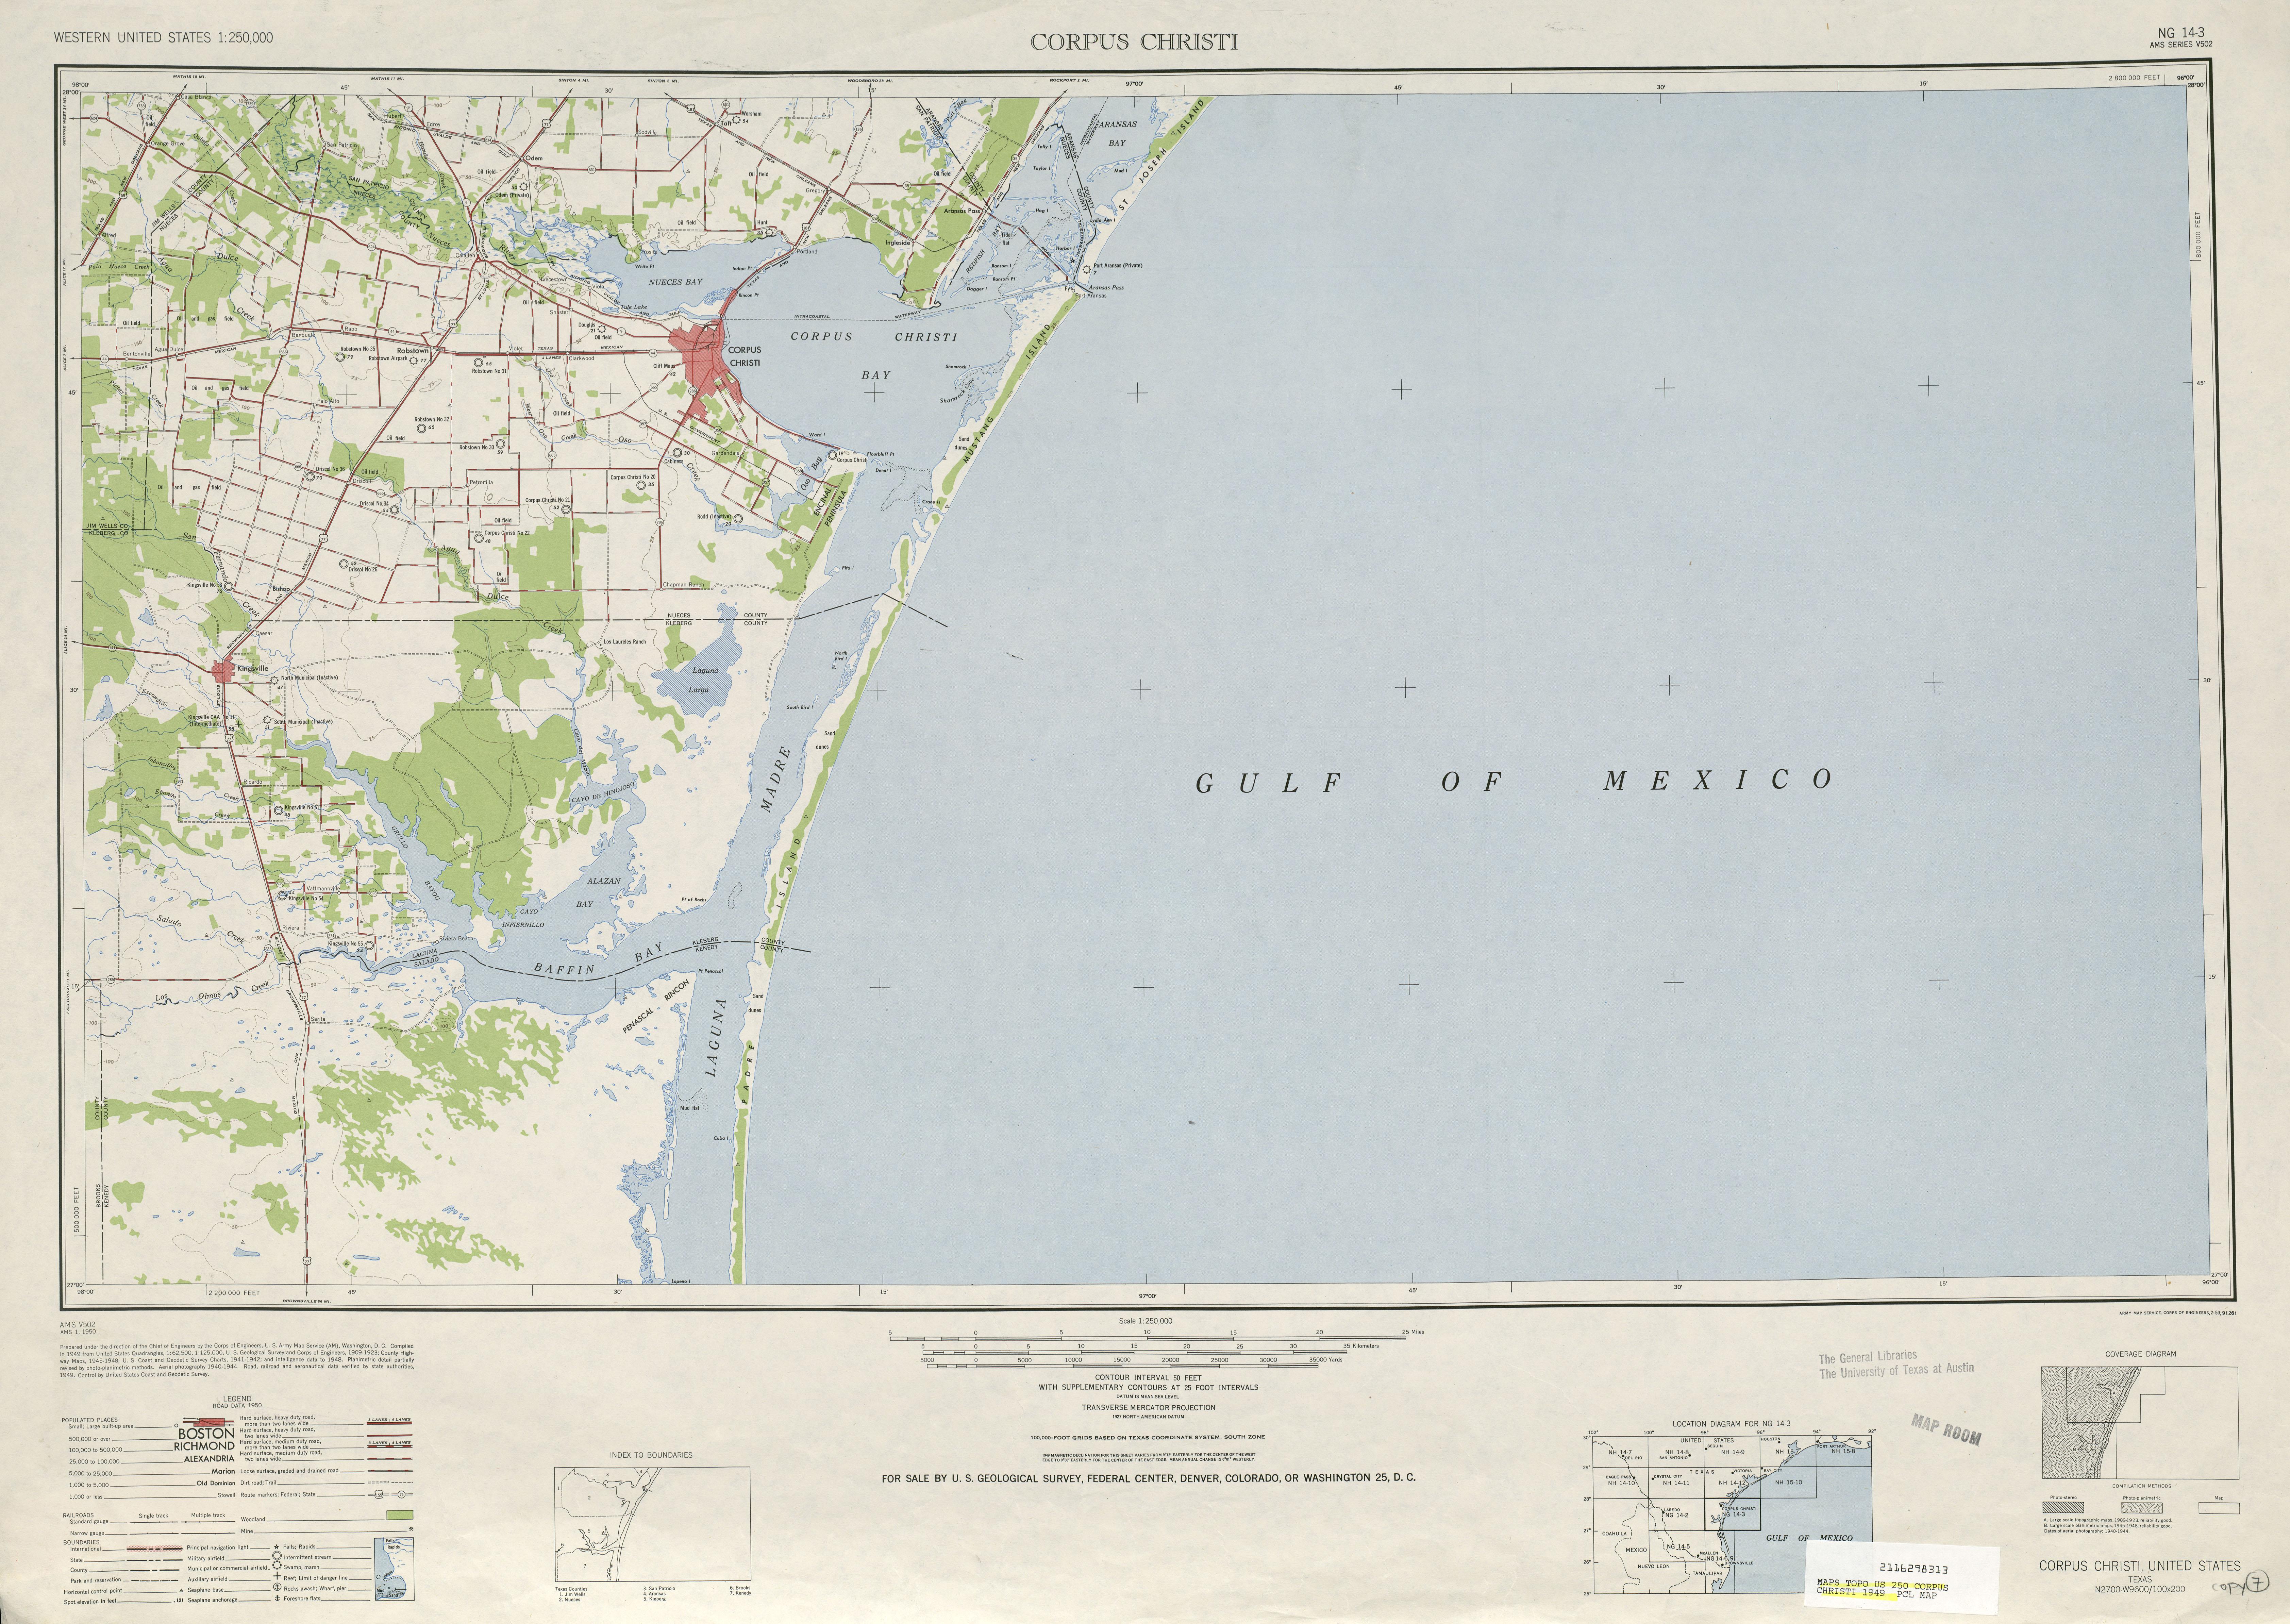 Corpus Christi Topographic Map Sheet, United States 1949